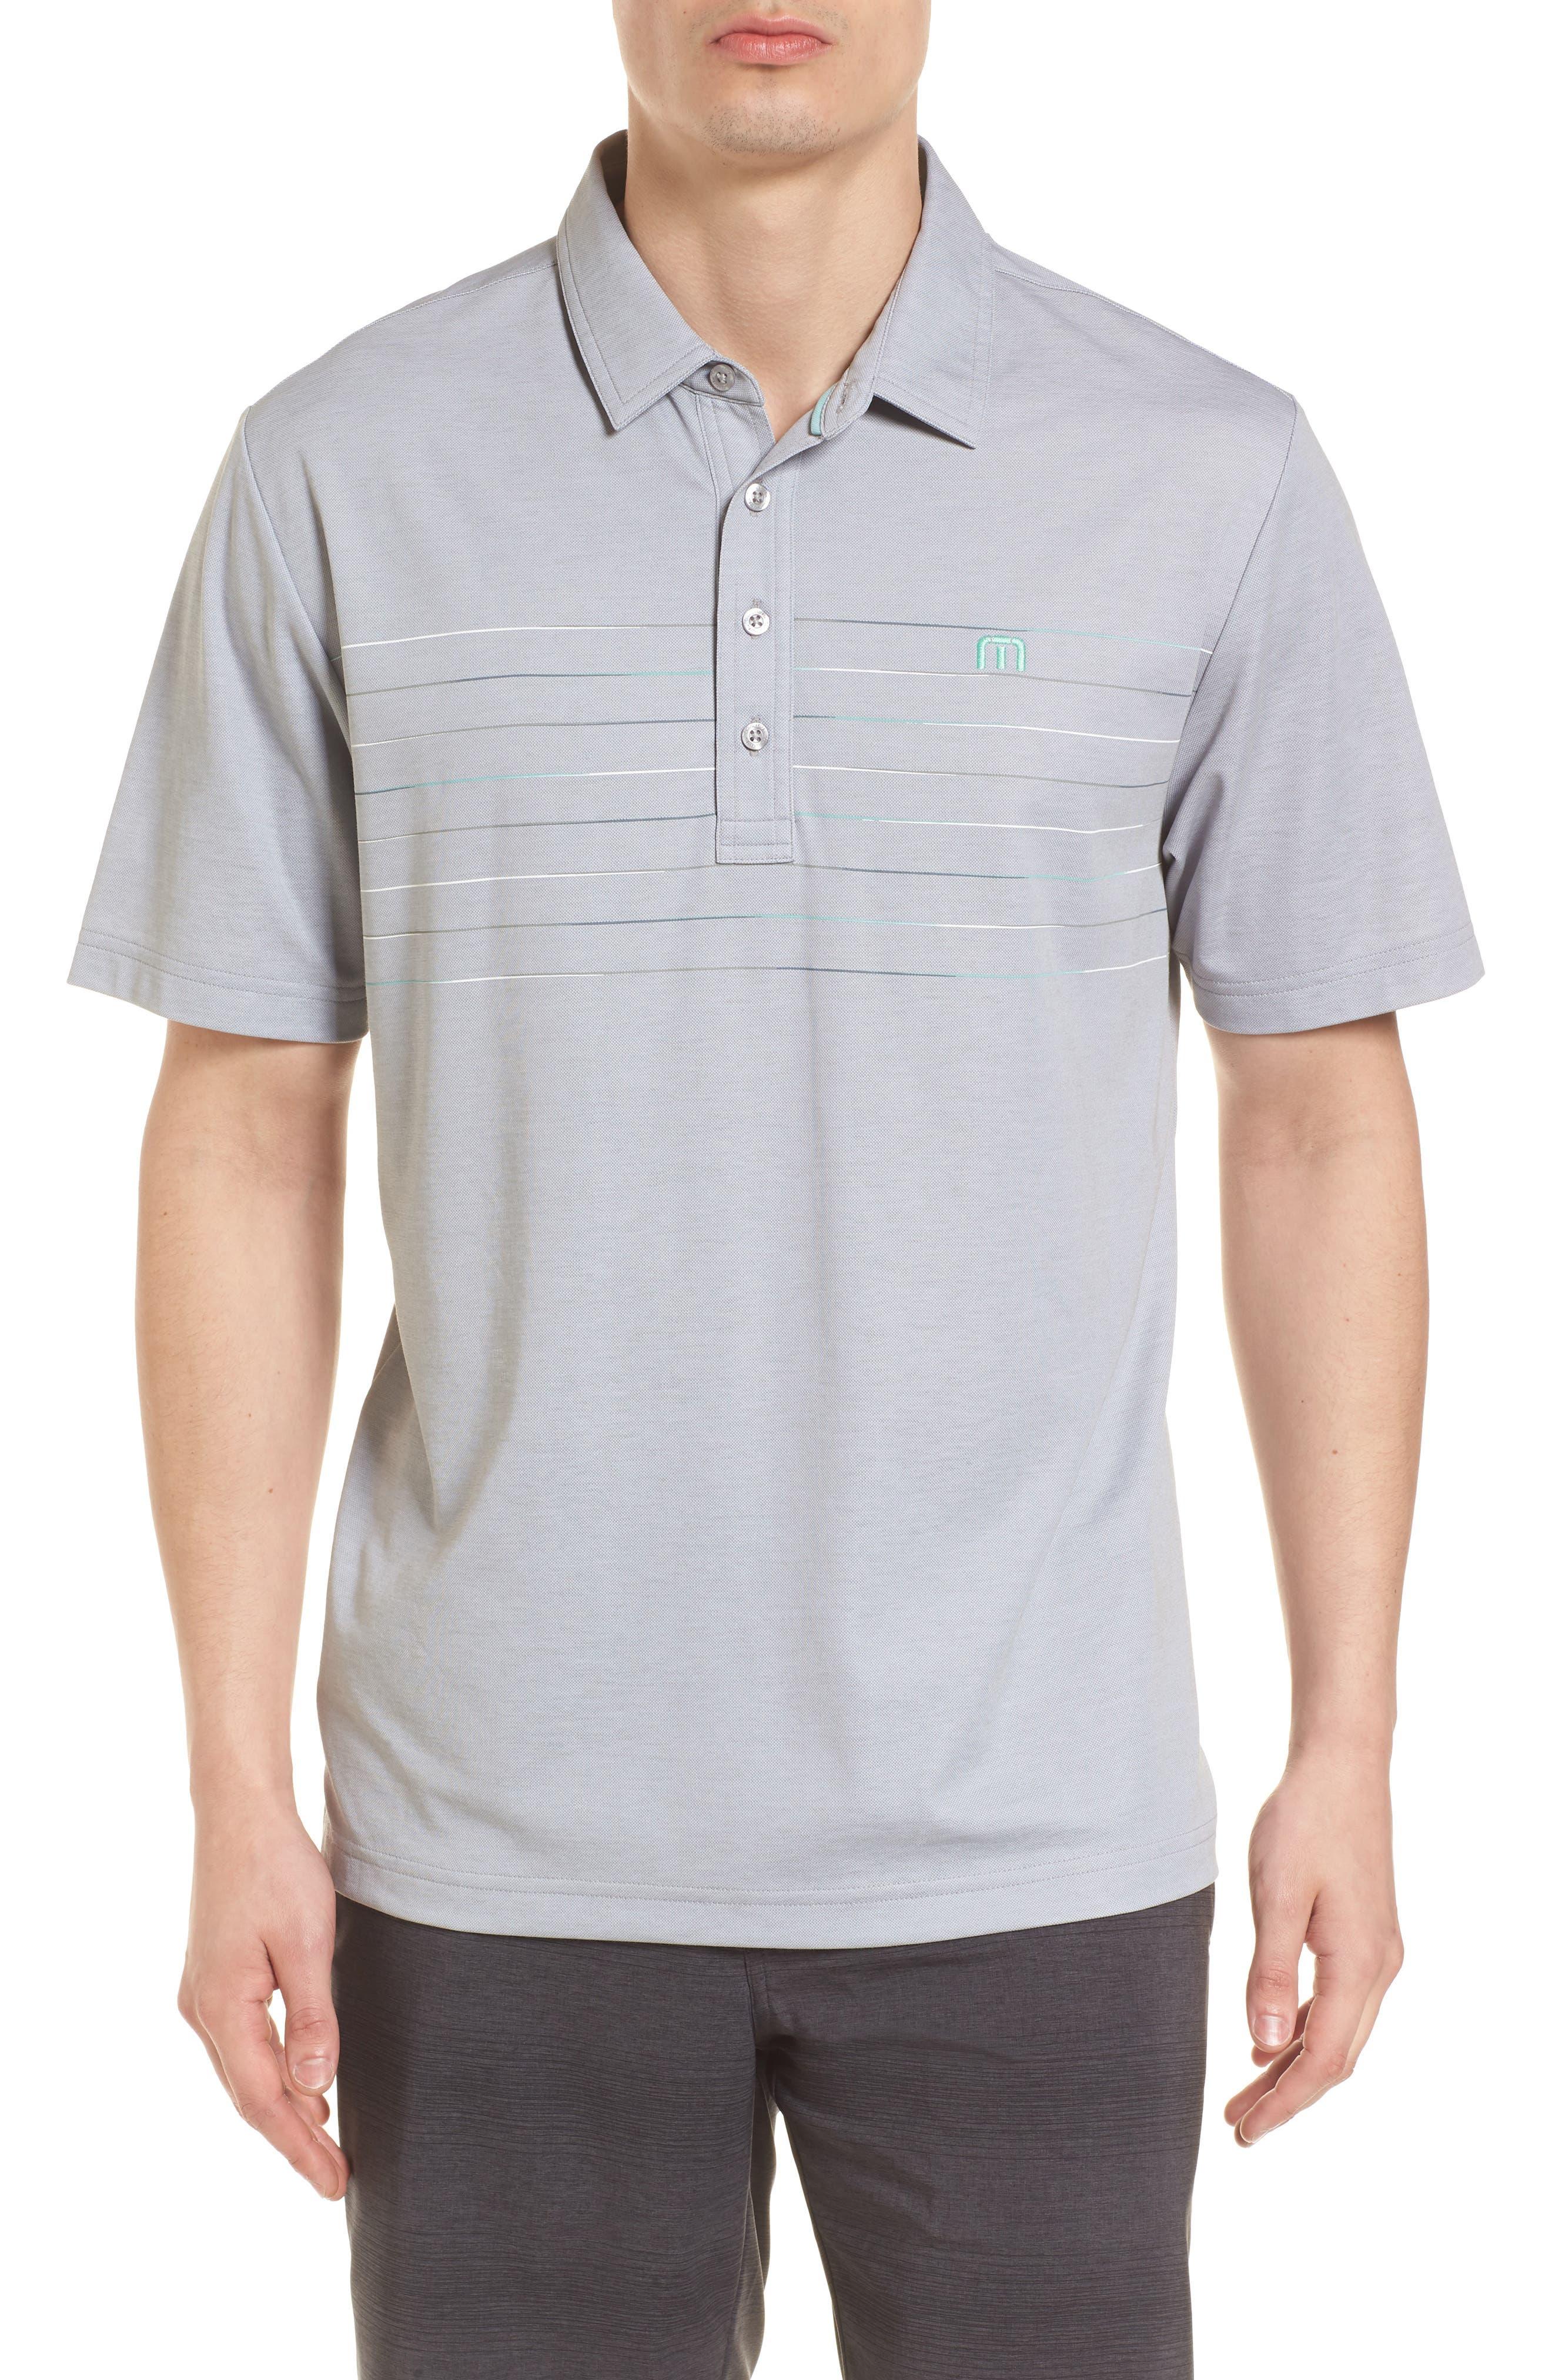 Good Good Polo Shirt,                             Main thumbnail 1, color,                             Heather Grey Monument